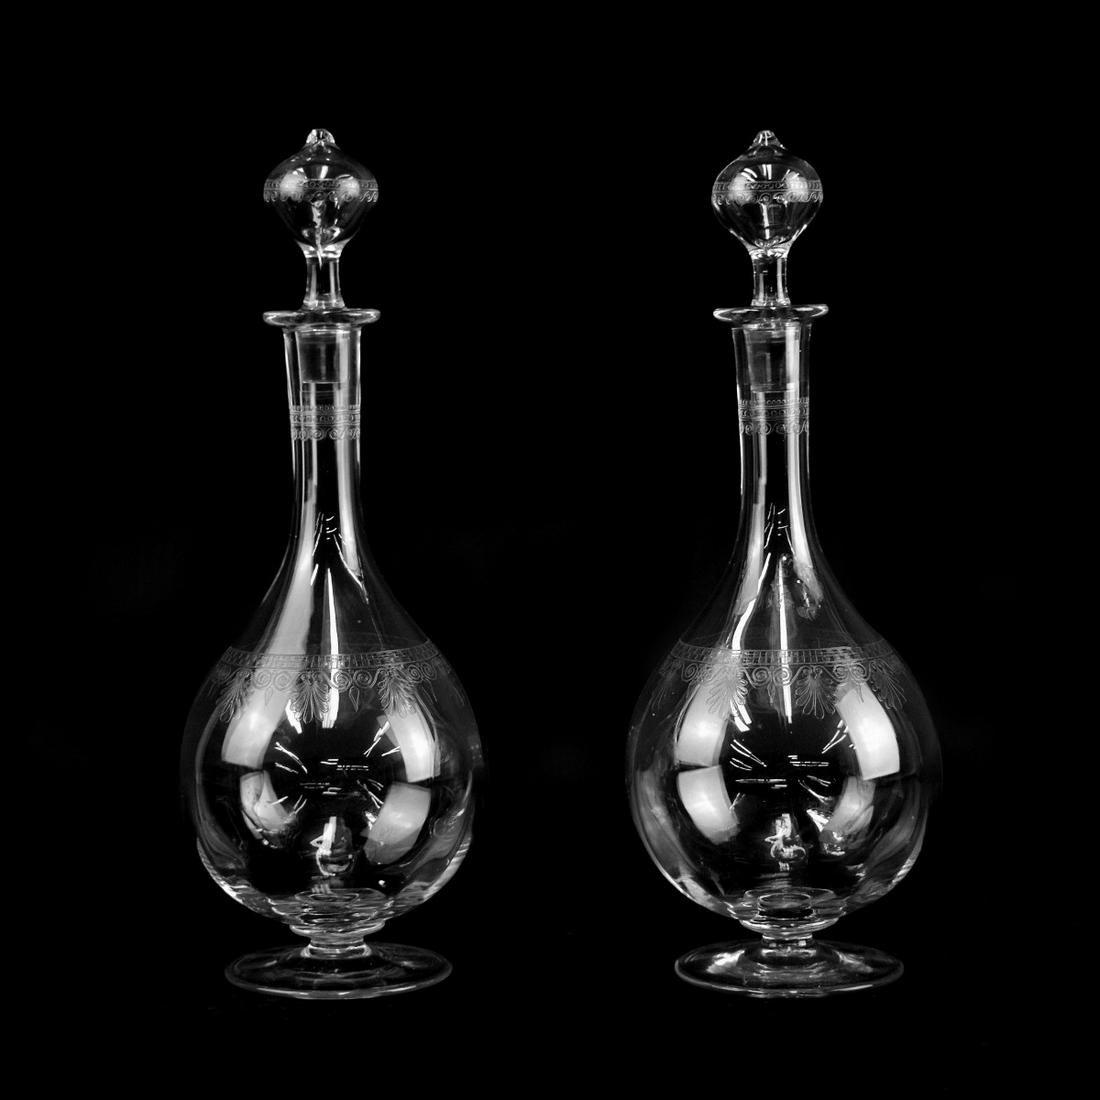 Pair of Antique Baccarat Decanters